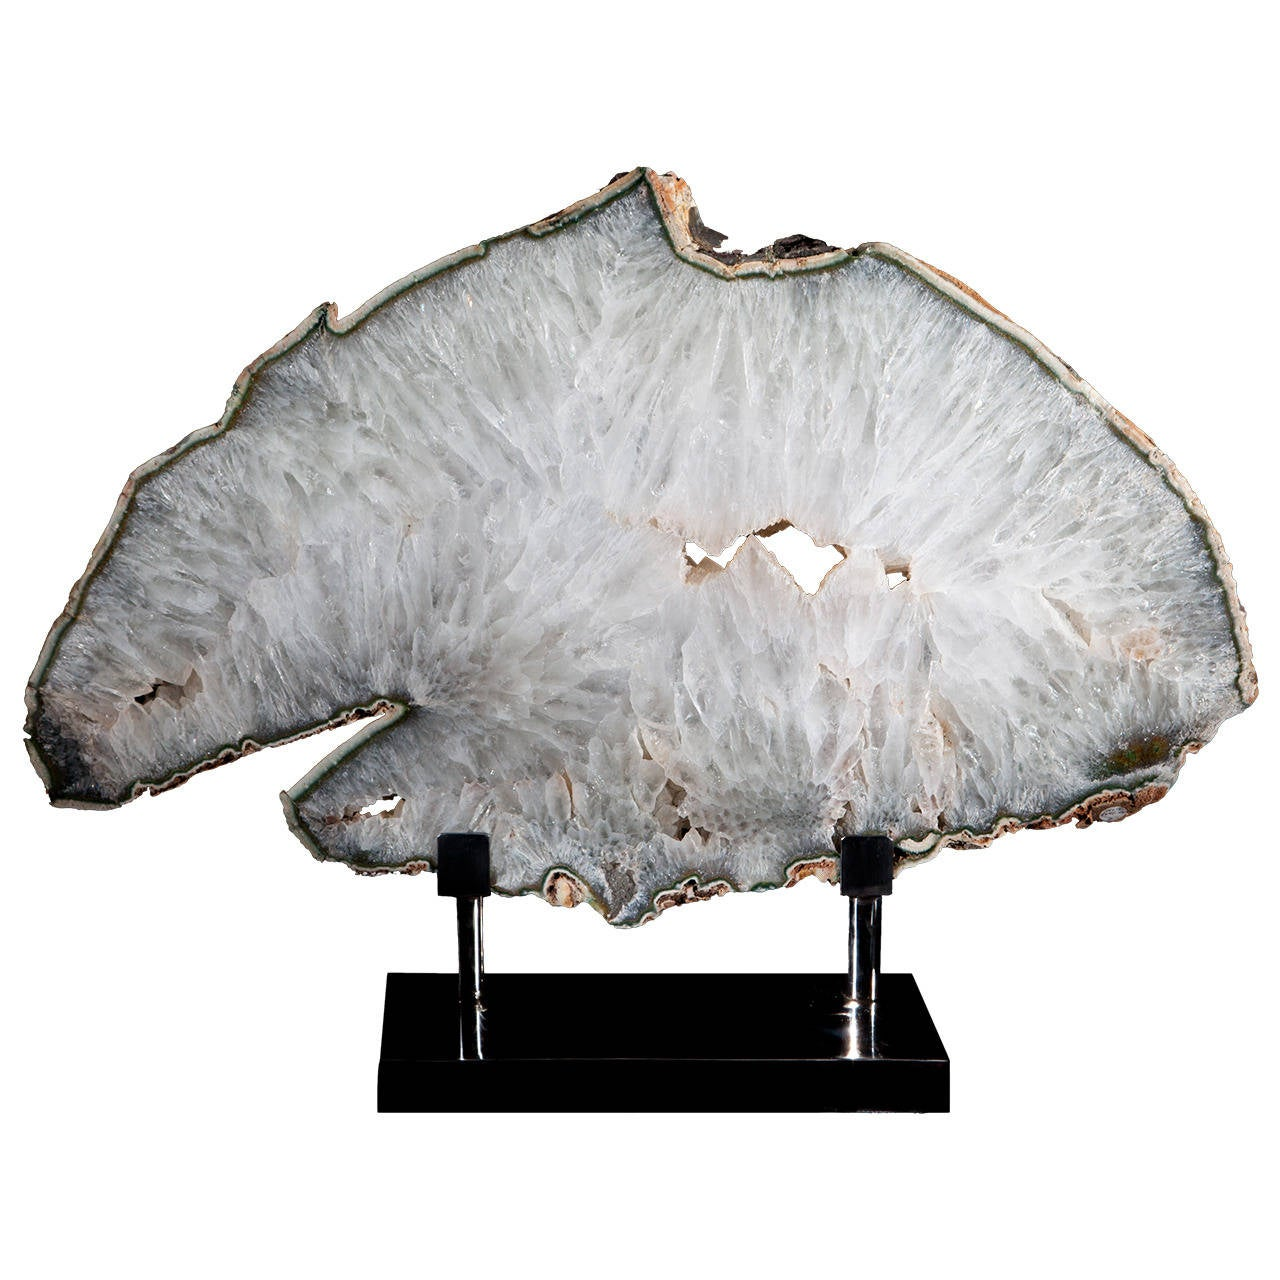 Mounted Quartz Crystal Slice